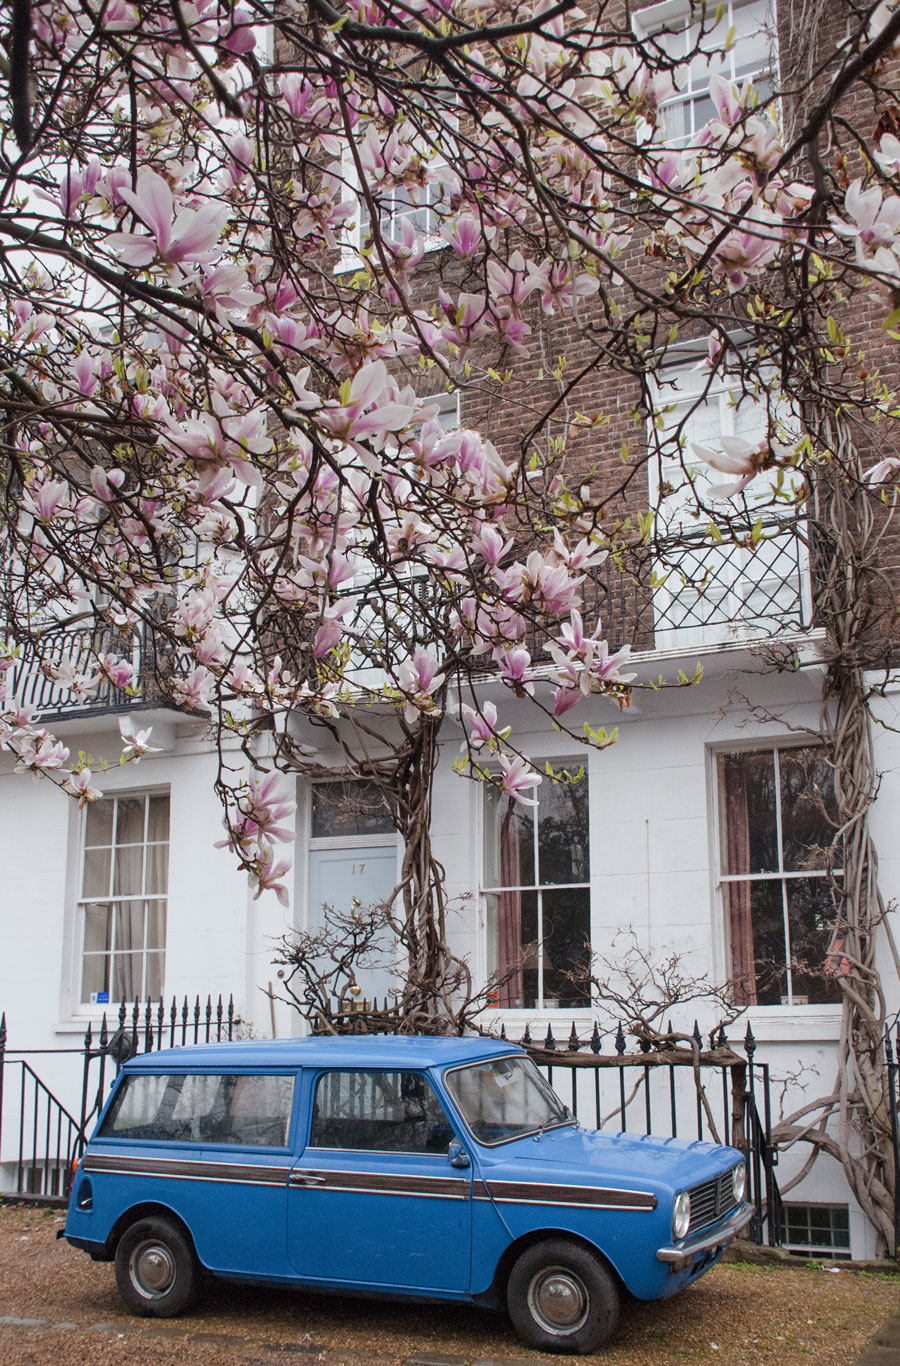 St.-Leonard's-Terrace-Chelsea-London-Magnolia-Blossom-Cherry-Blossom-Wisteria